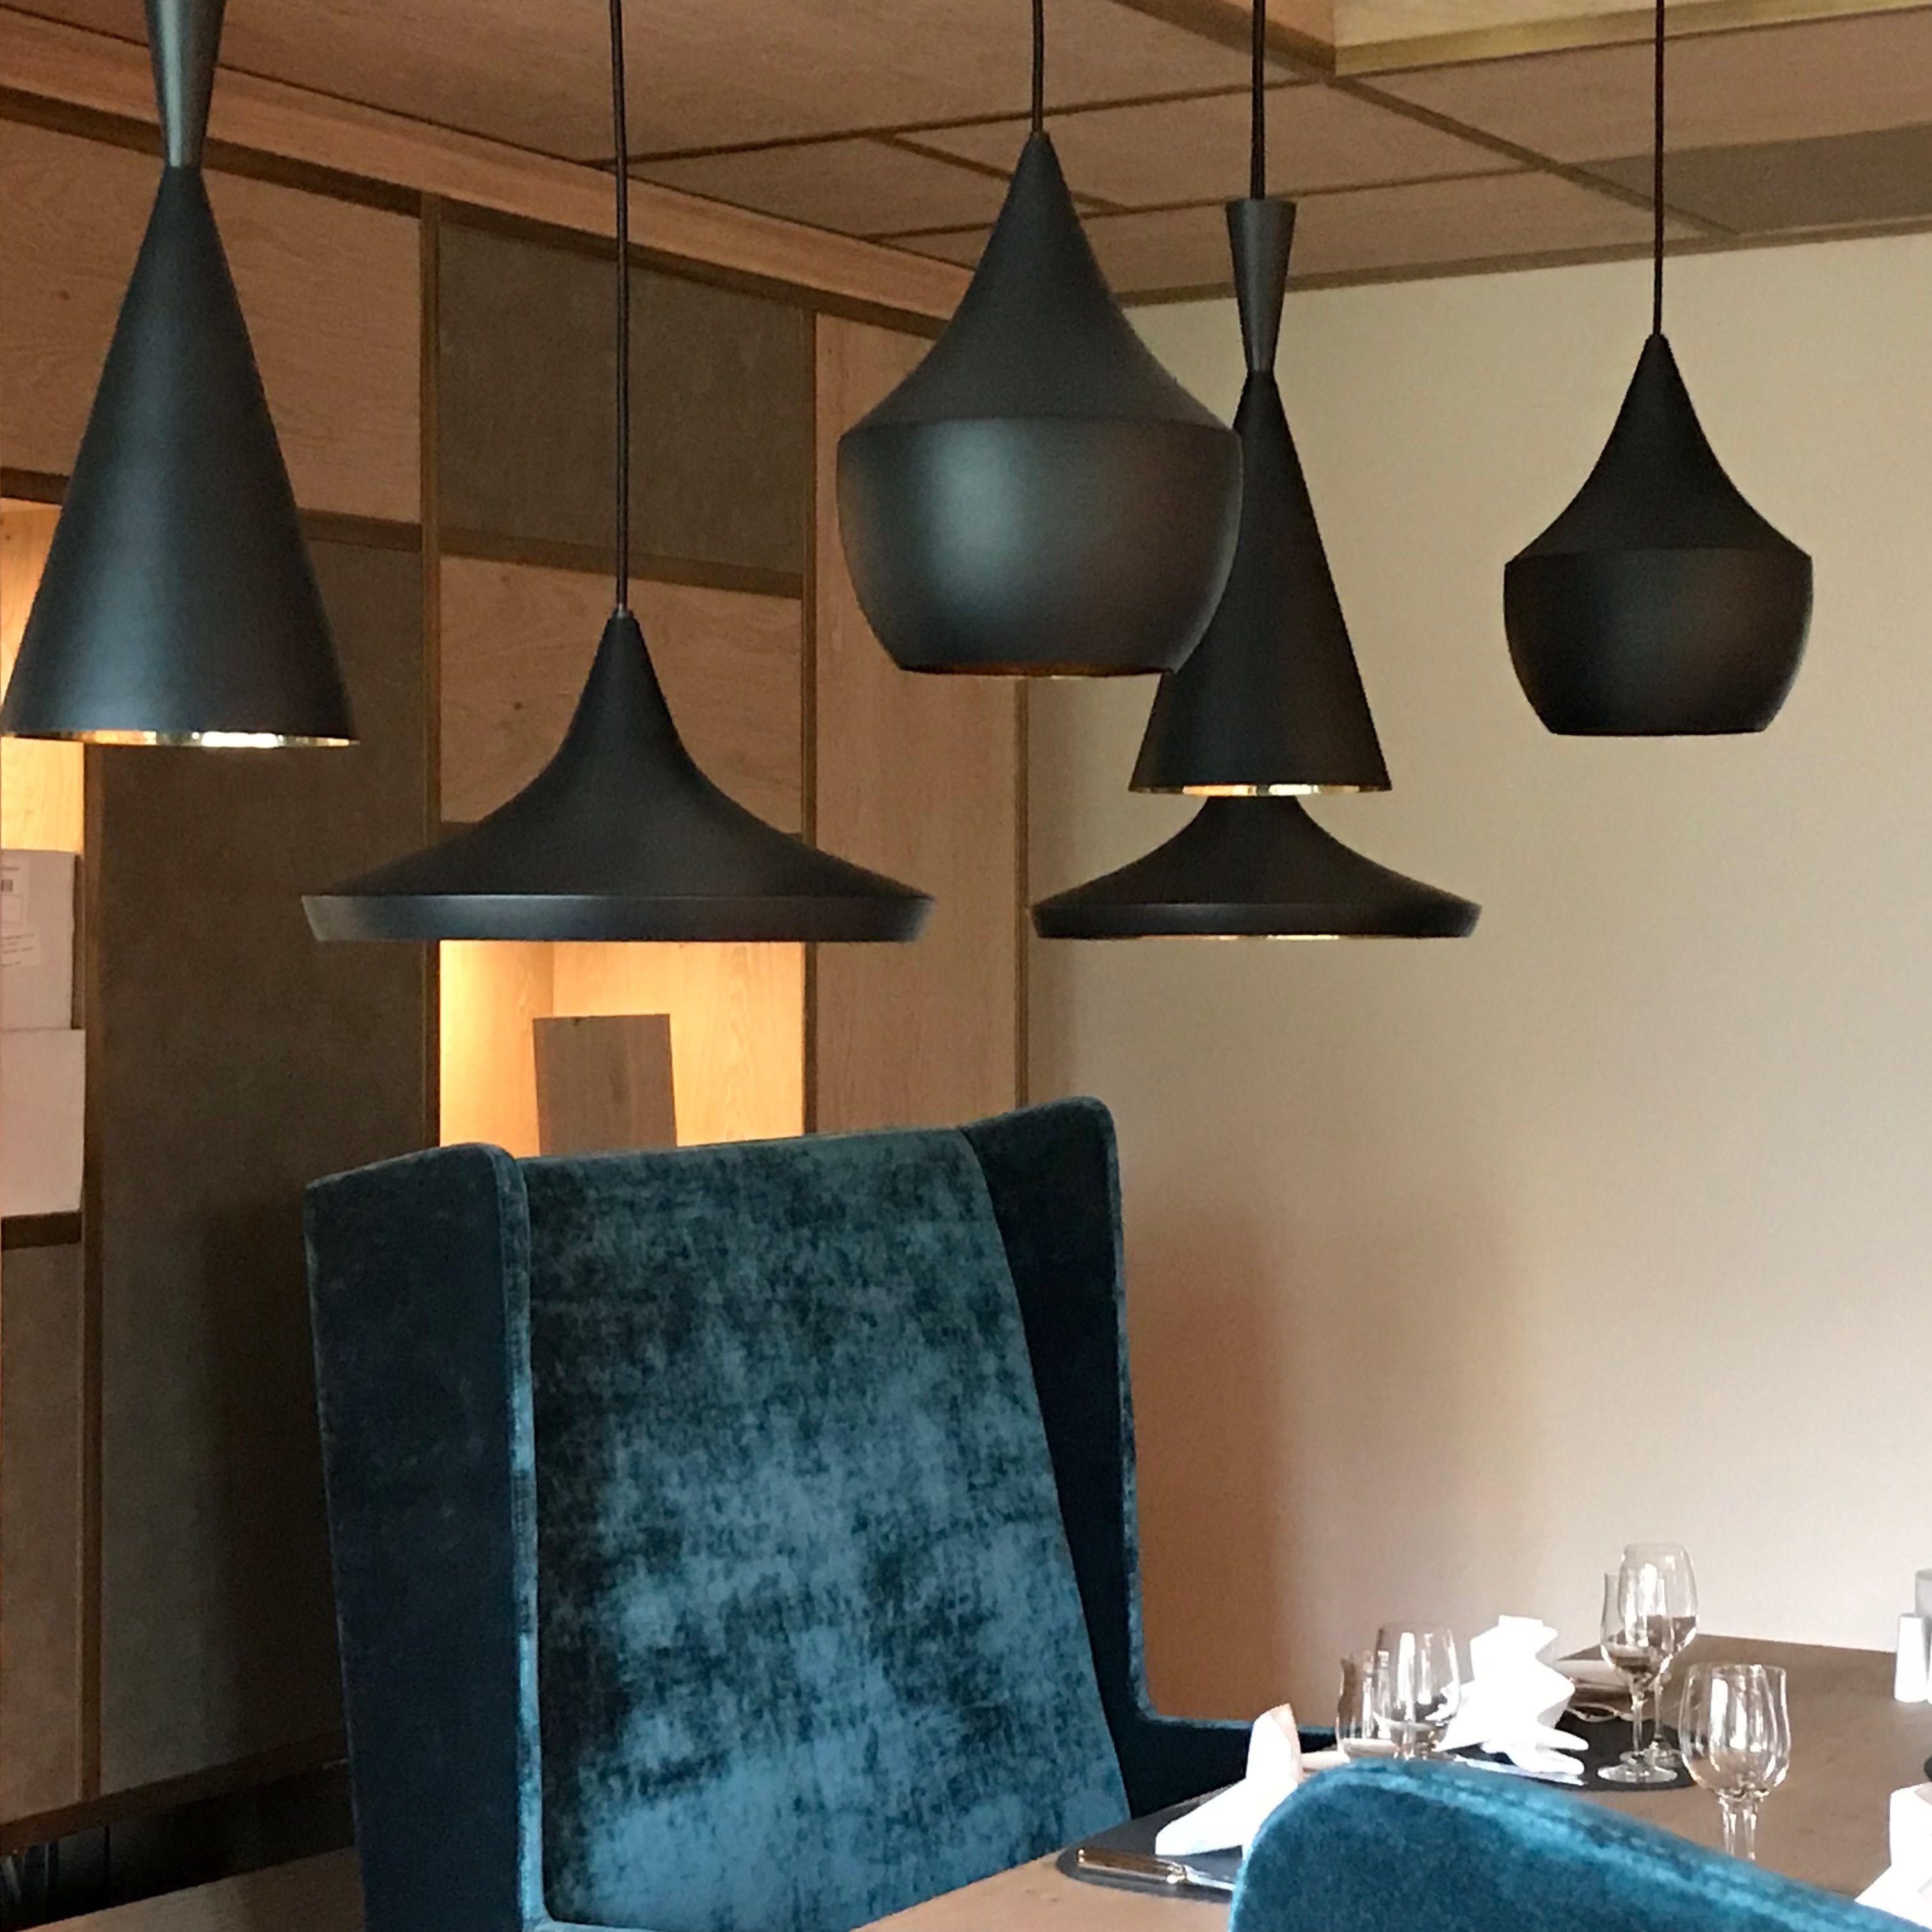 Deckenlampen moderne Deckenbeleuchtung Esszimmerbeleuchtung ...